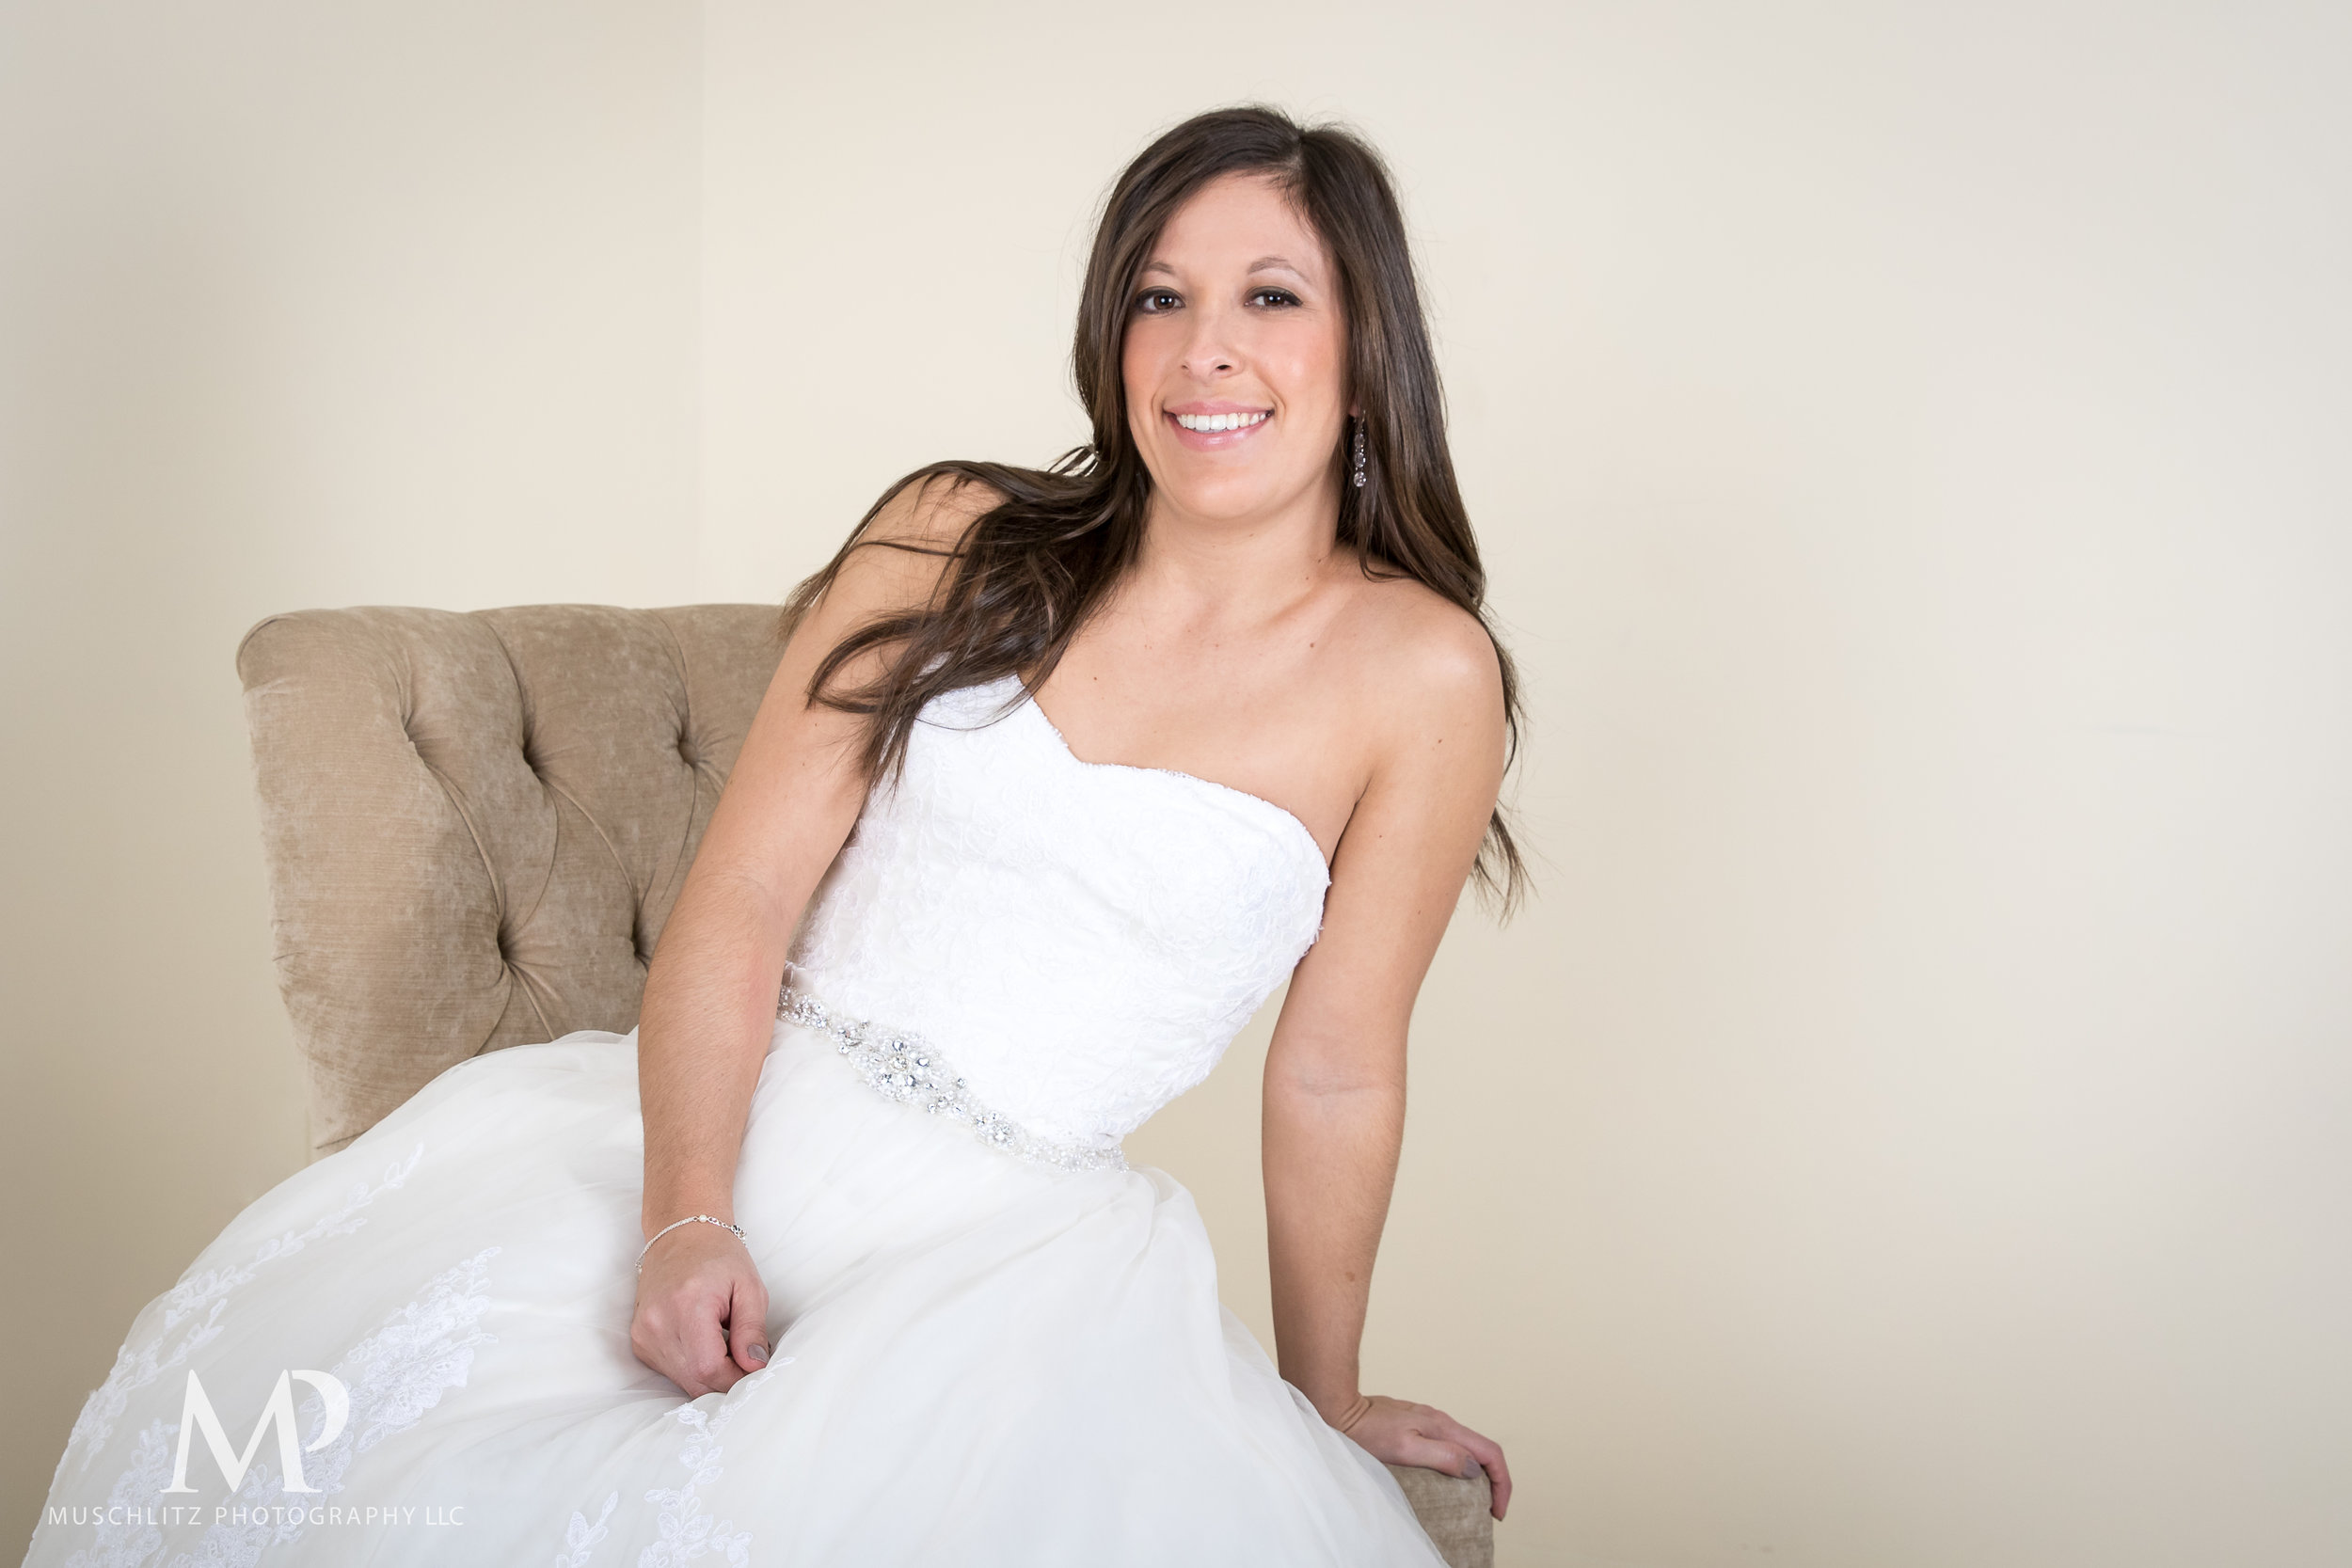 beauty-bridal-glam-the-dress-portraits-photographer-studio-columbus-ohio-gahanna-muschlitz-photography-021.JPG